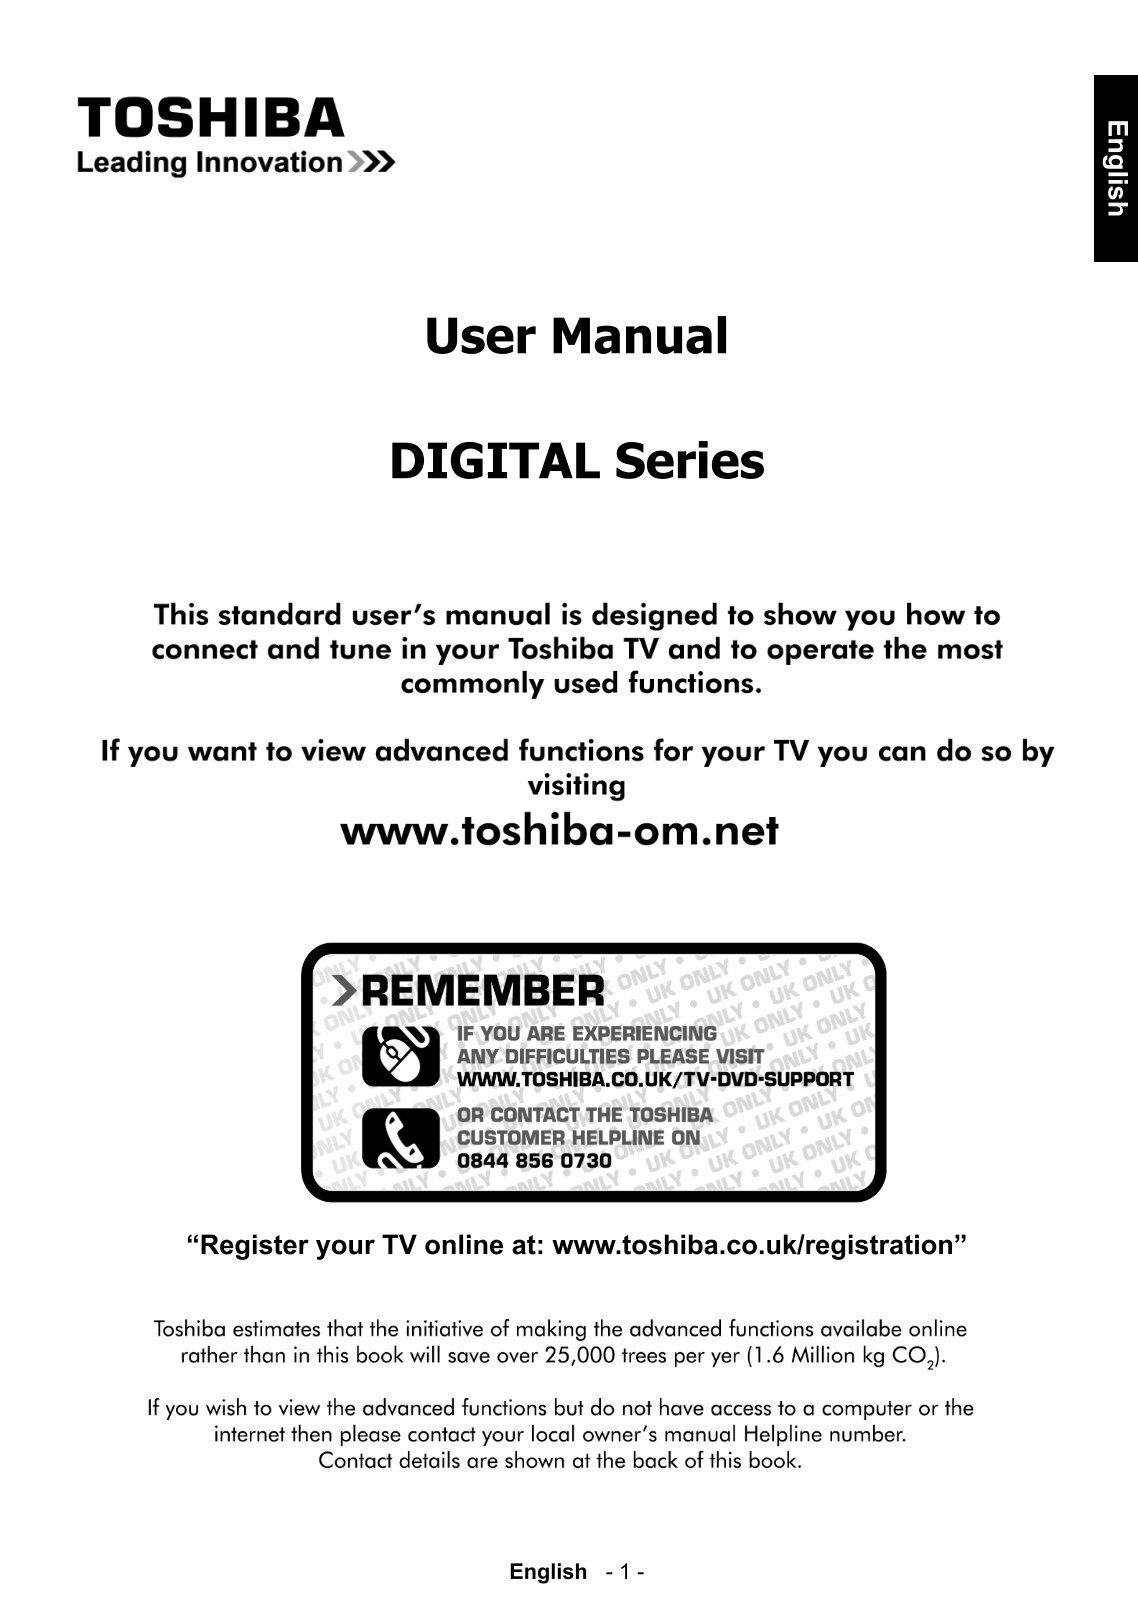 10 free magazines from southern discounts co uk rh yumpu com User Manual Cartoon Manual